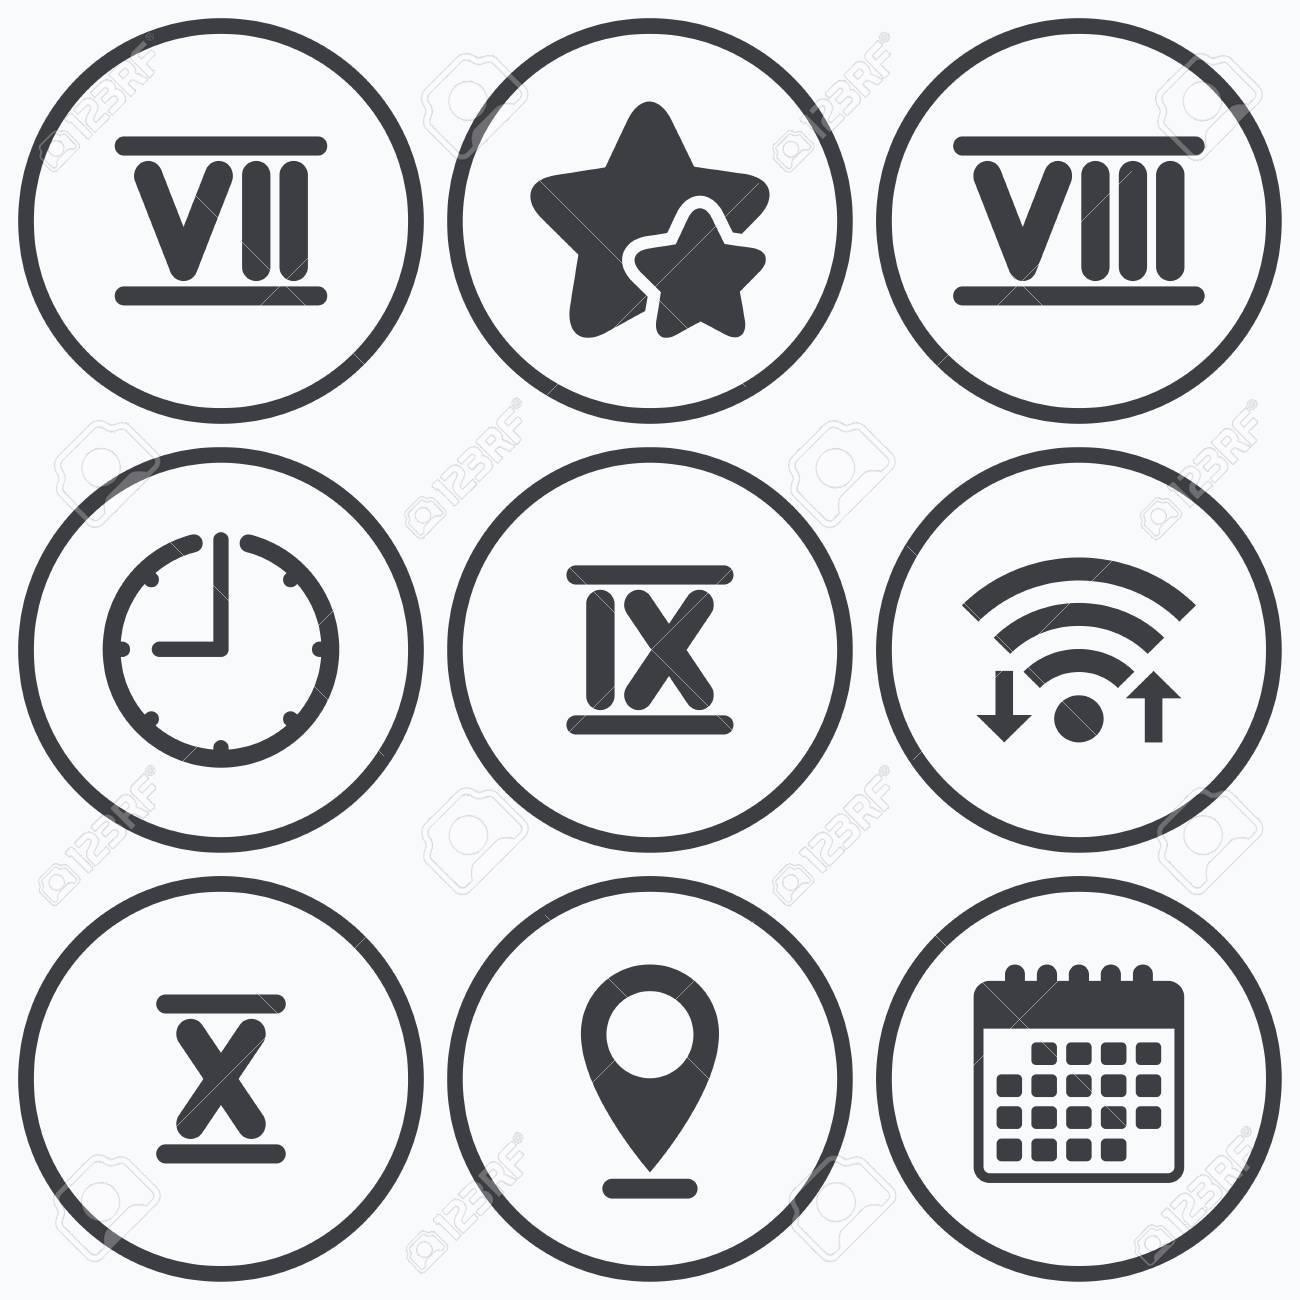 1300x1300 Clock, Wifi Stars Icons. Roman Numeral Icons. 7, 8, 9